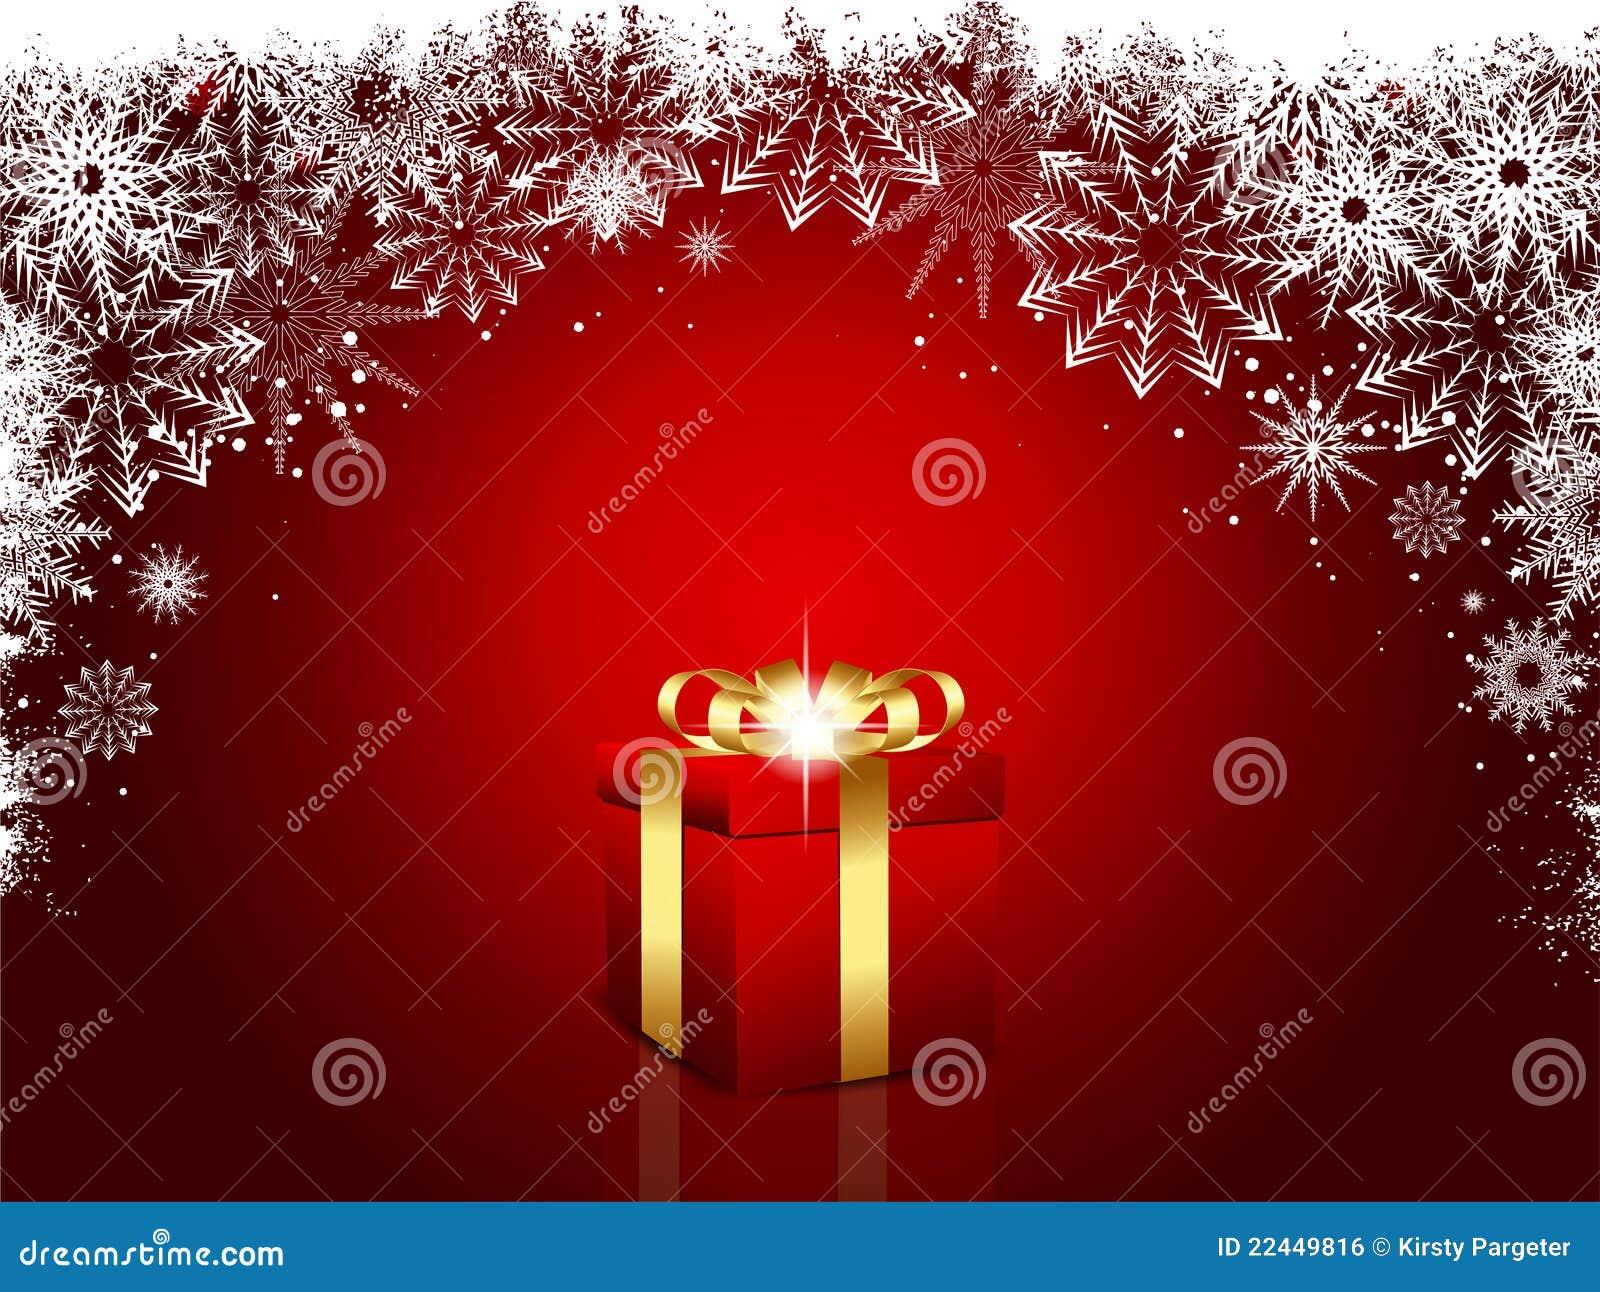 Luxury Xmas Gifts: Luxury Christmas Gift Royalty Free Stock Image